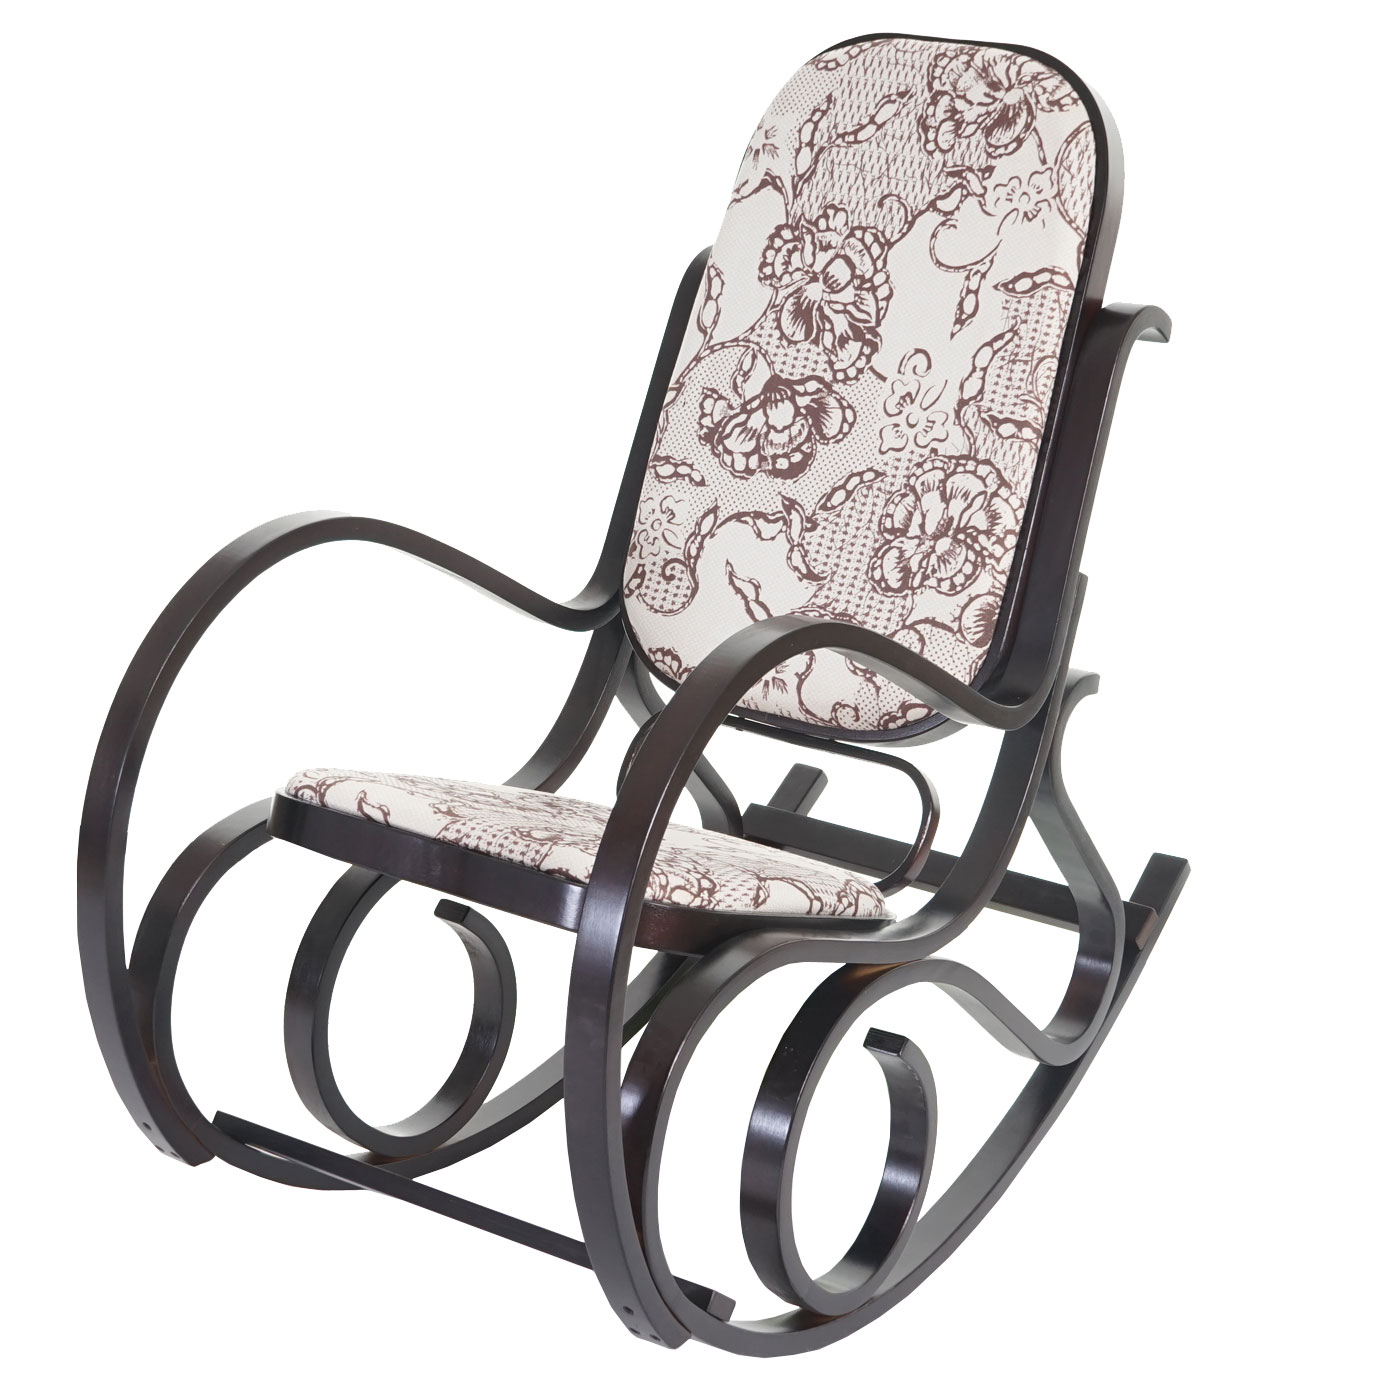 schaukelstuhl schwingsessel m41 aus holz jacquard braun. Black Bedroom Furniture Sets. Home Design Ideas